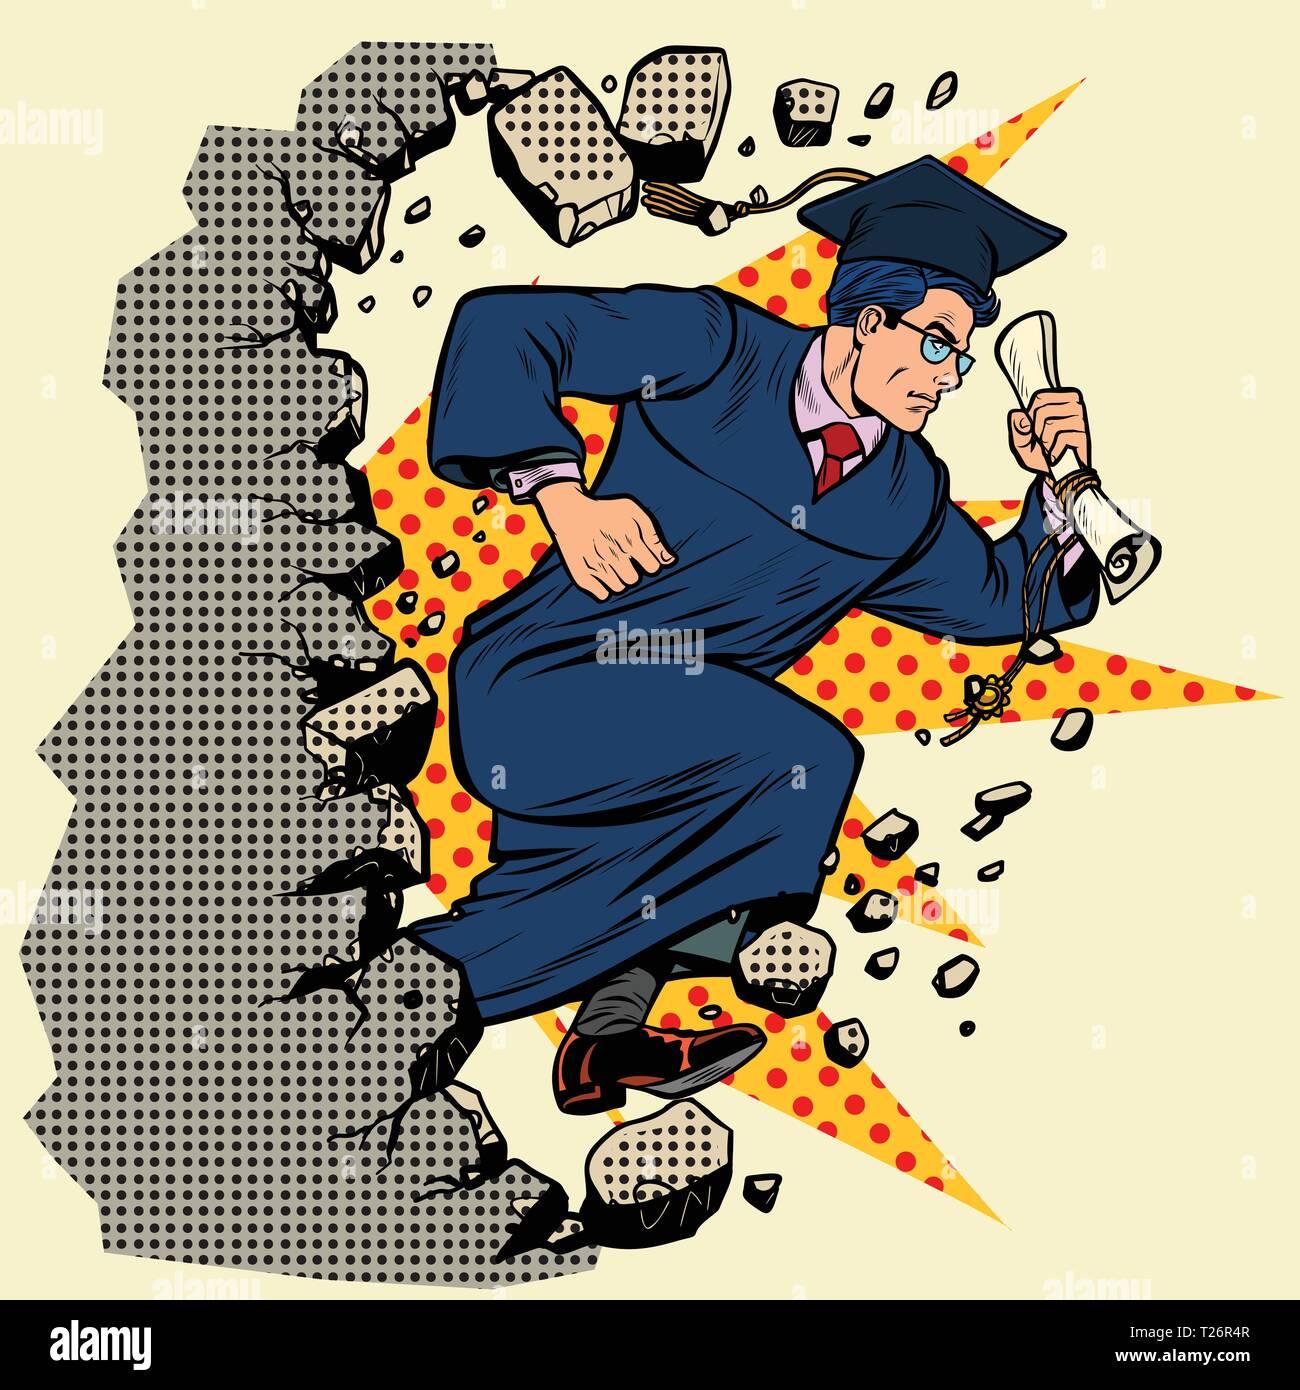 graduate University College breaks a wall, destroys stereotypes. Moving forward, personal development. Pop art retro vector illustration vintage kitsc - Stock Vector